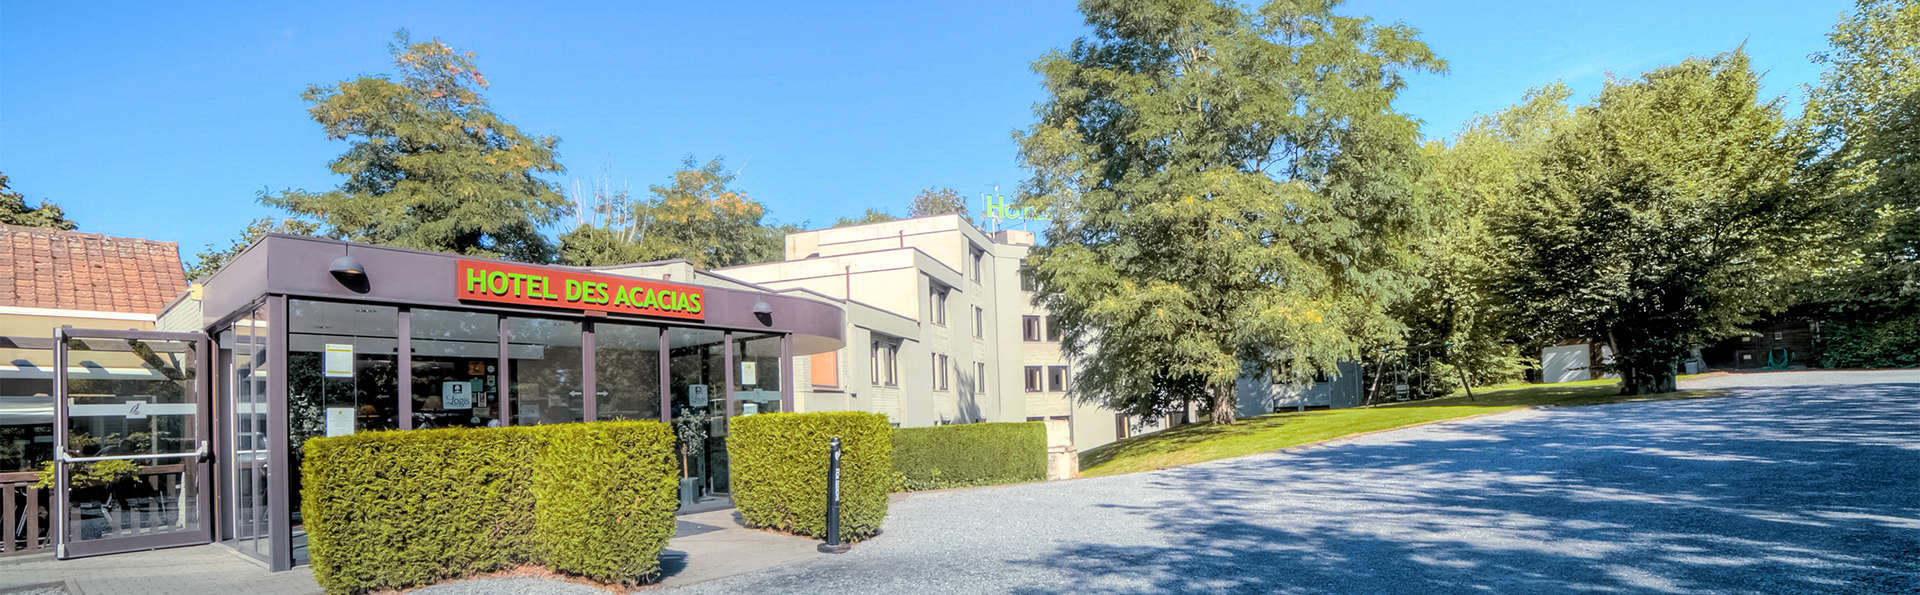 Logis Hôtel - Restaurant des Acacias - EDIT_ext2.jpg